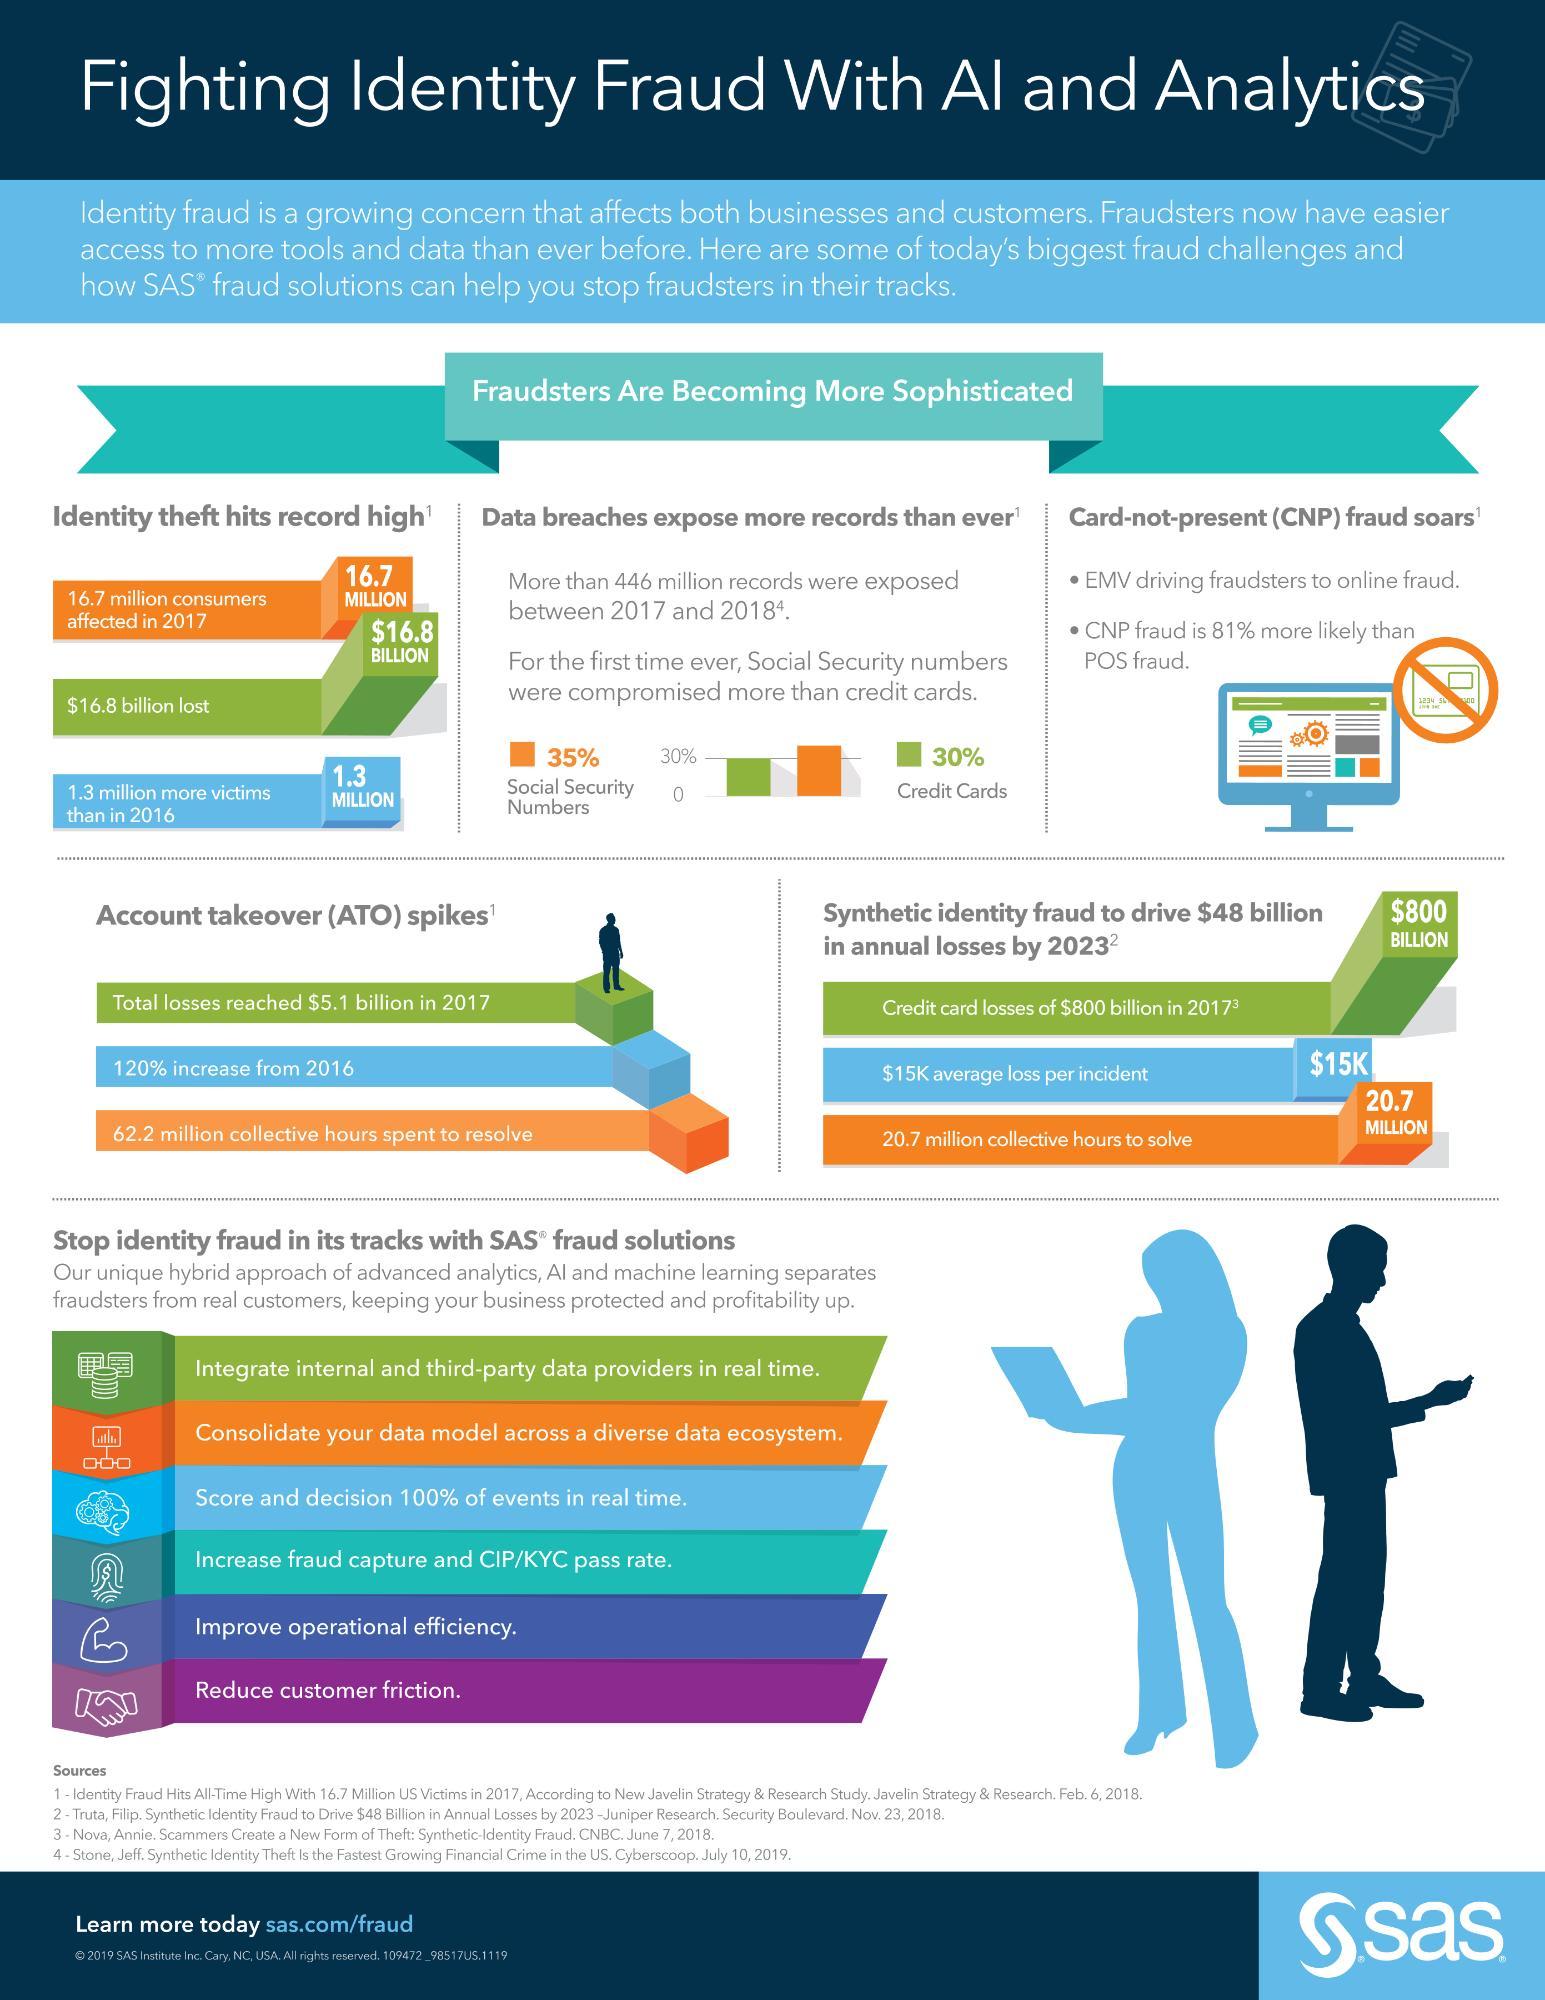 fighting identity fraud infographic